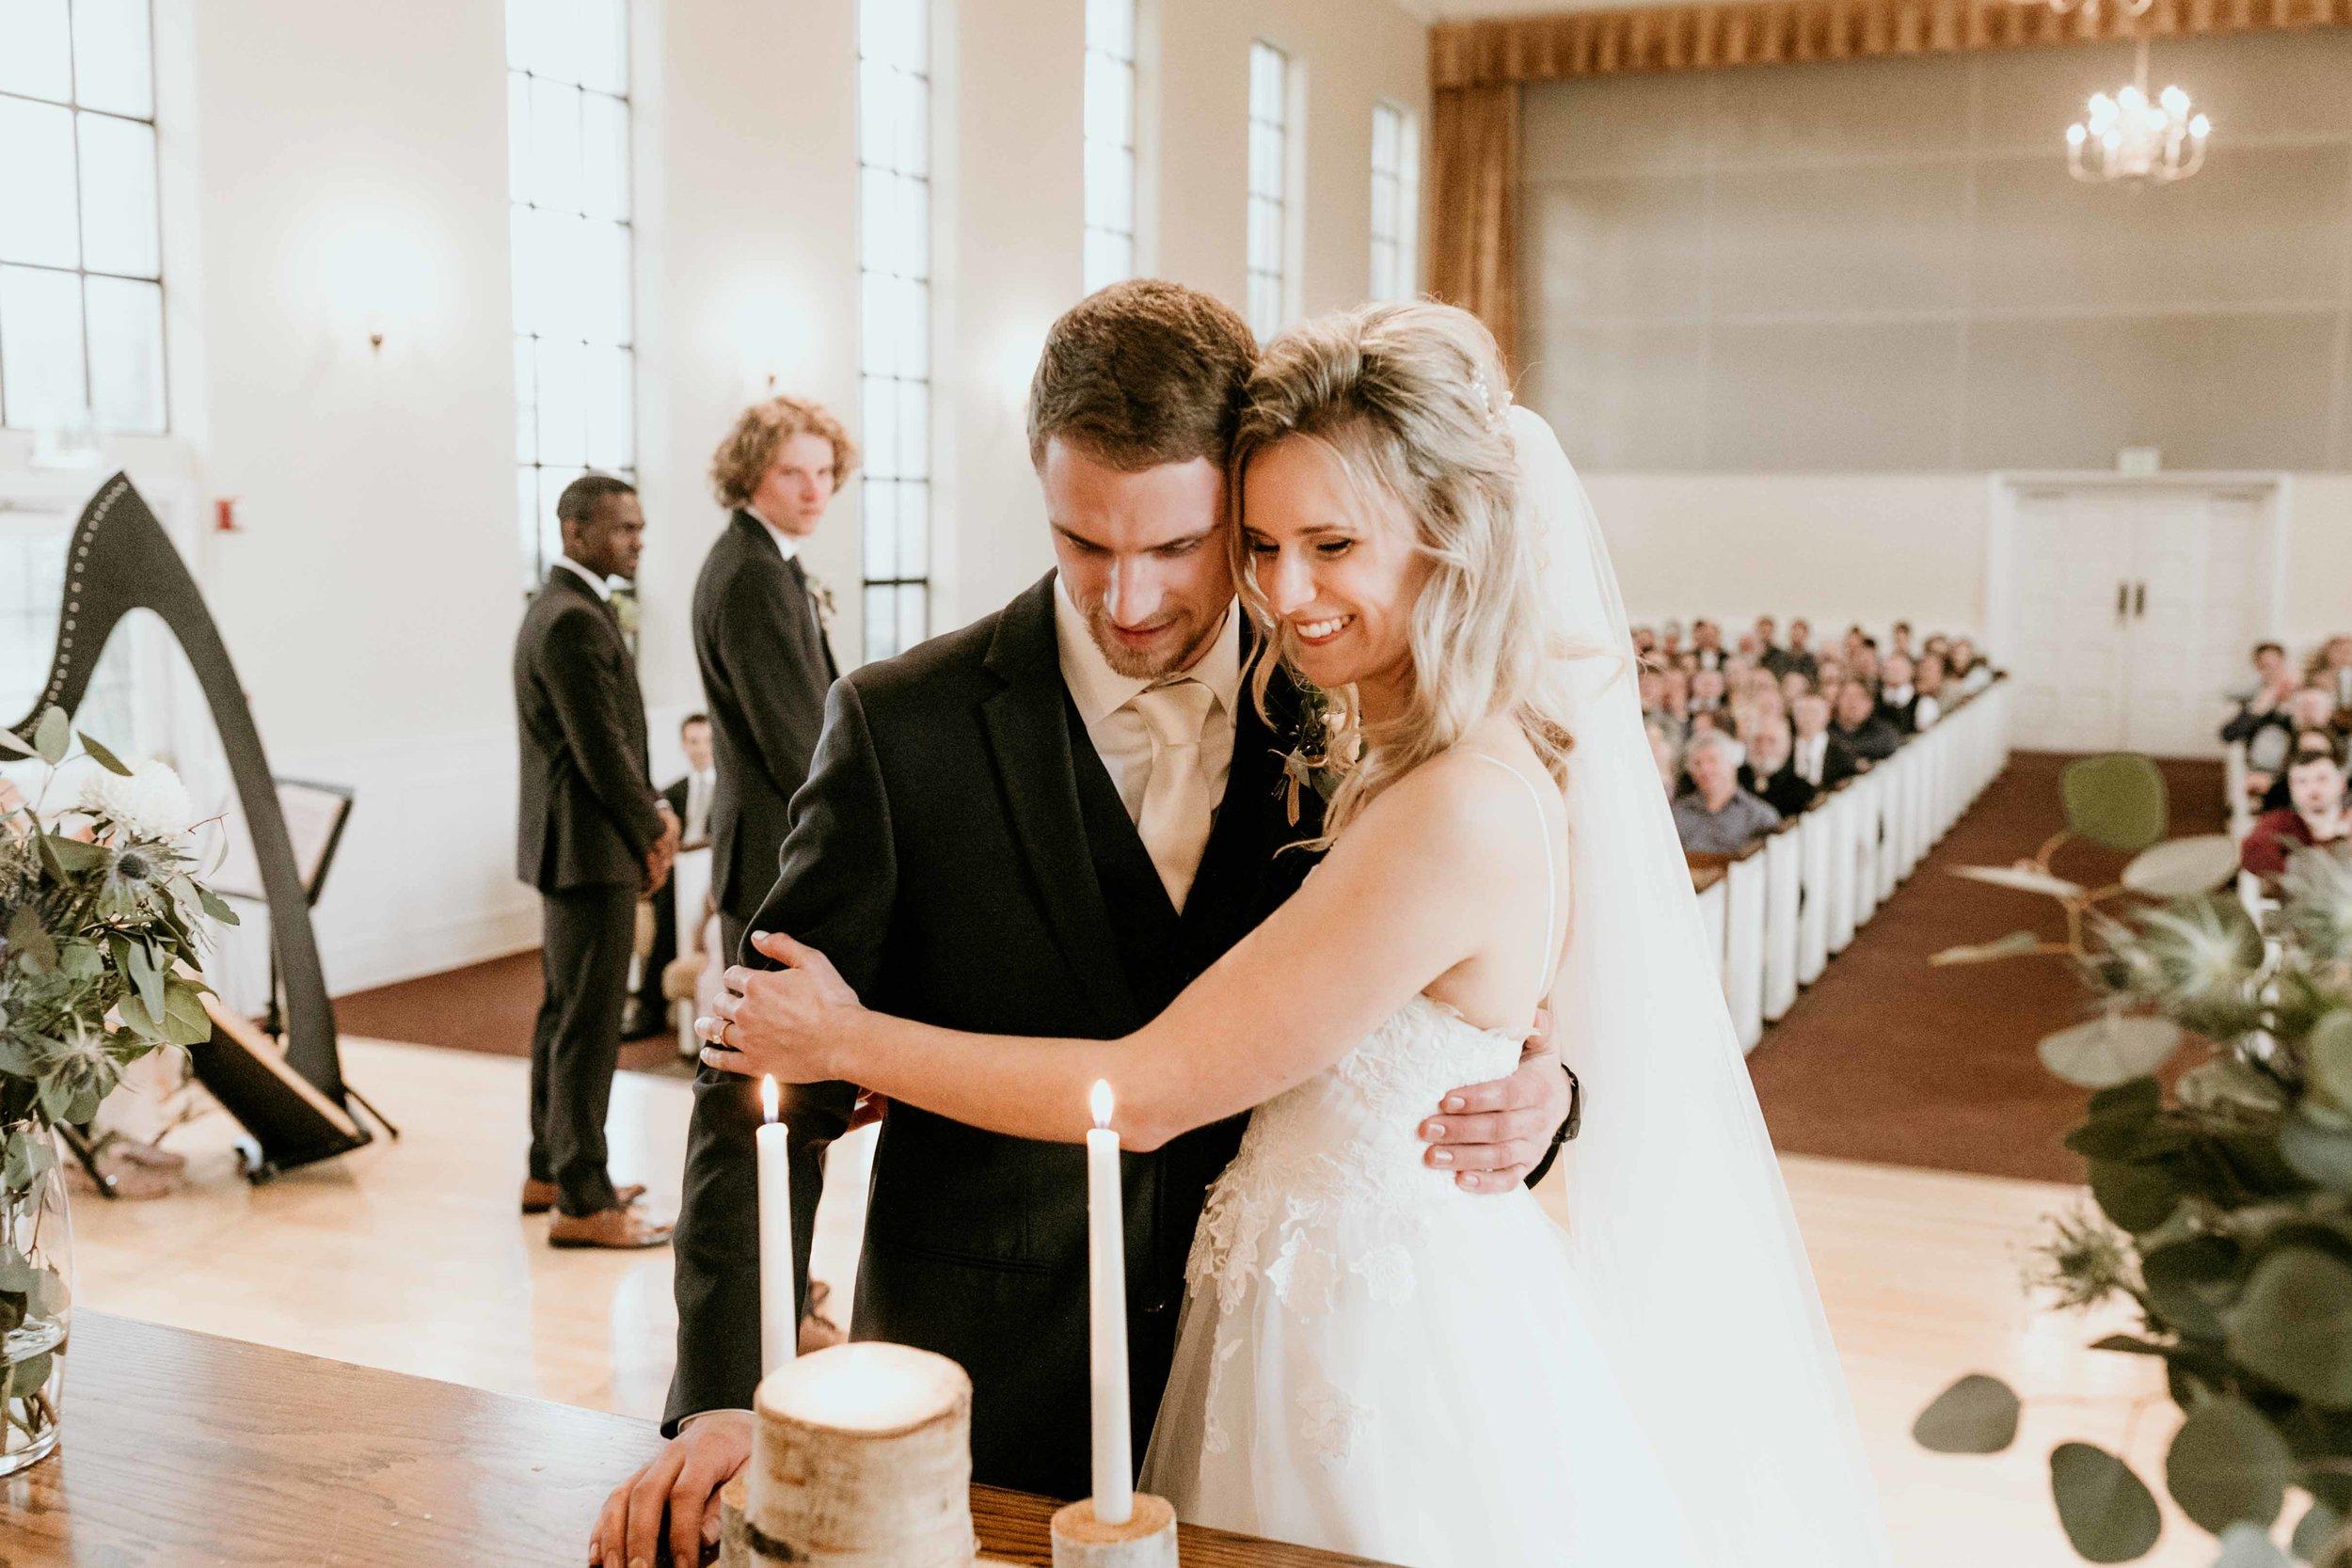 kilworth-memorial-chapel-wedding-71.jpg